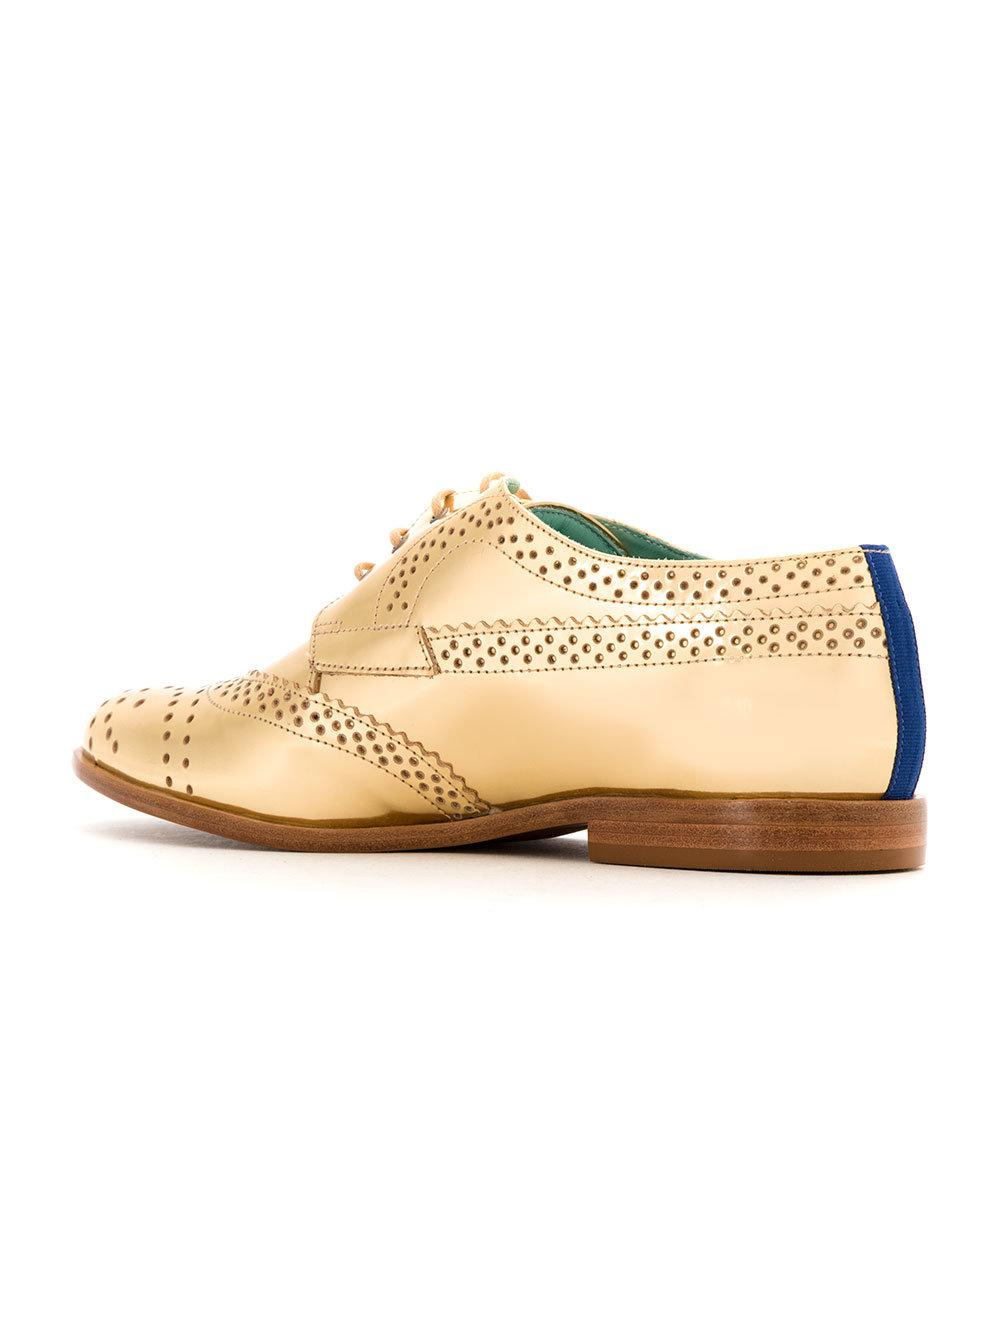 leather oxfords - Yellow & Orange Blue Bird Shoes eP1V2mvw